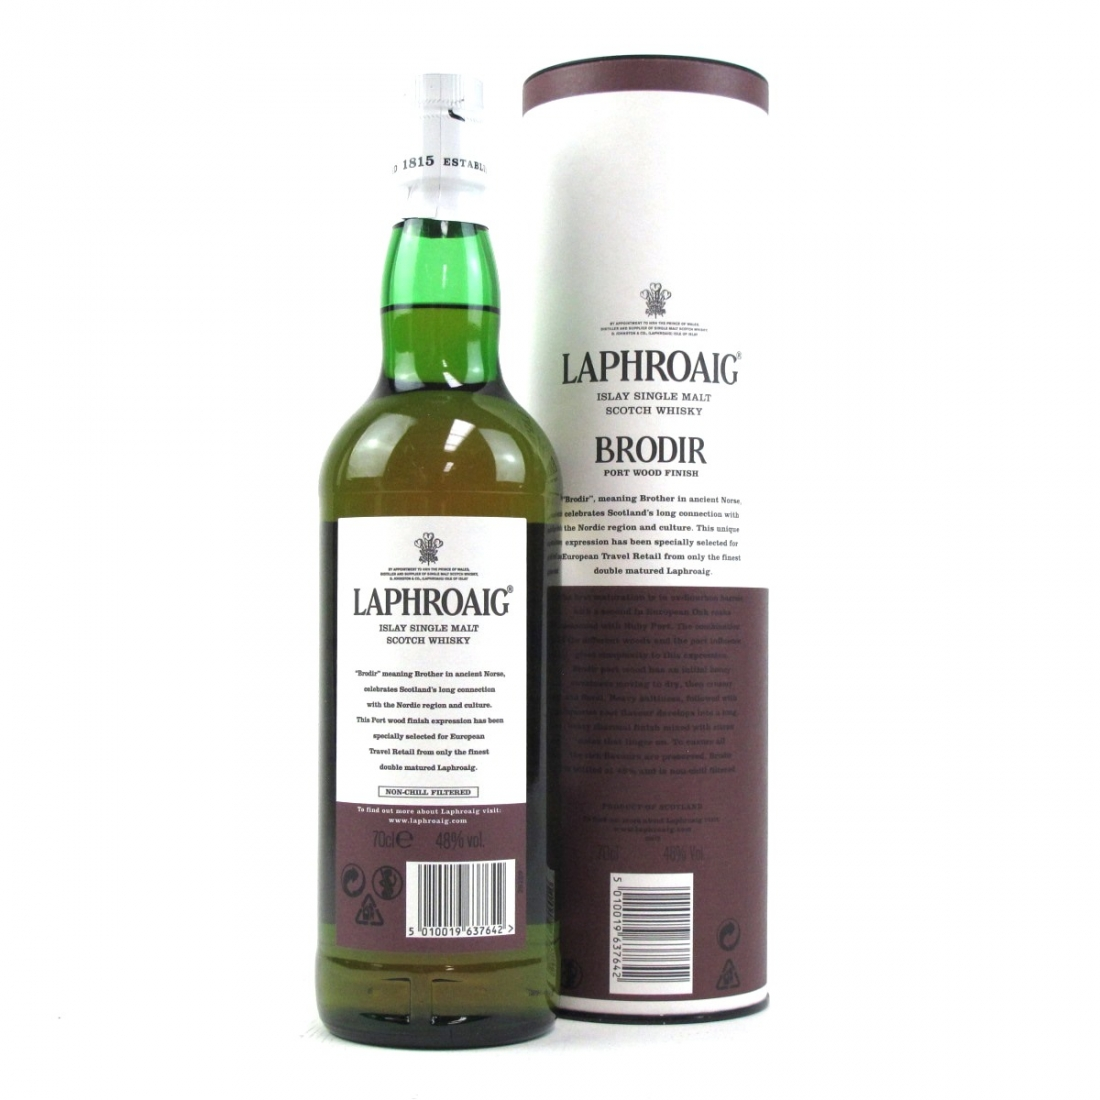 Laphroaig Brodir Batch #001